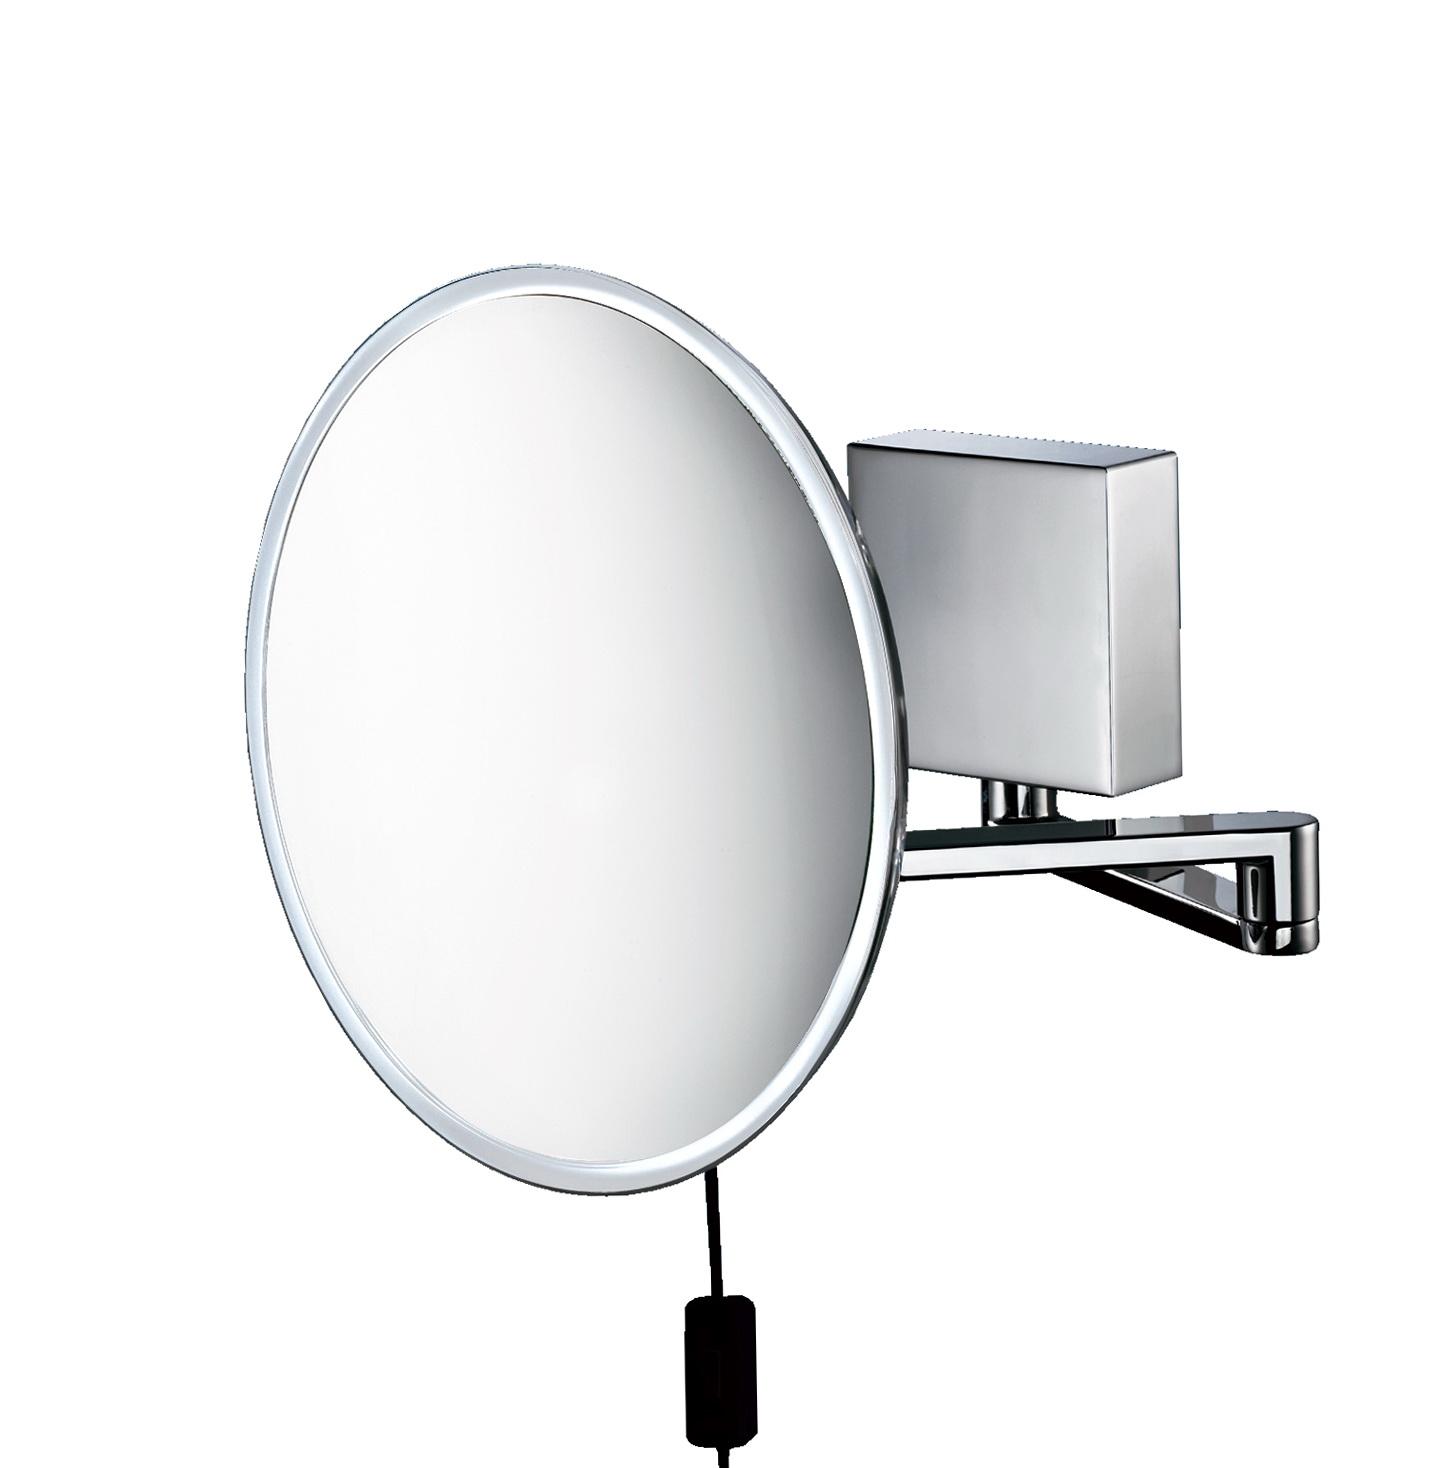 Wall Mounted Makeup Mirror 8x